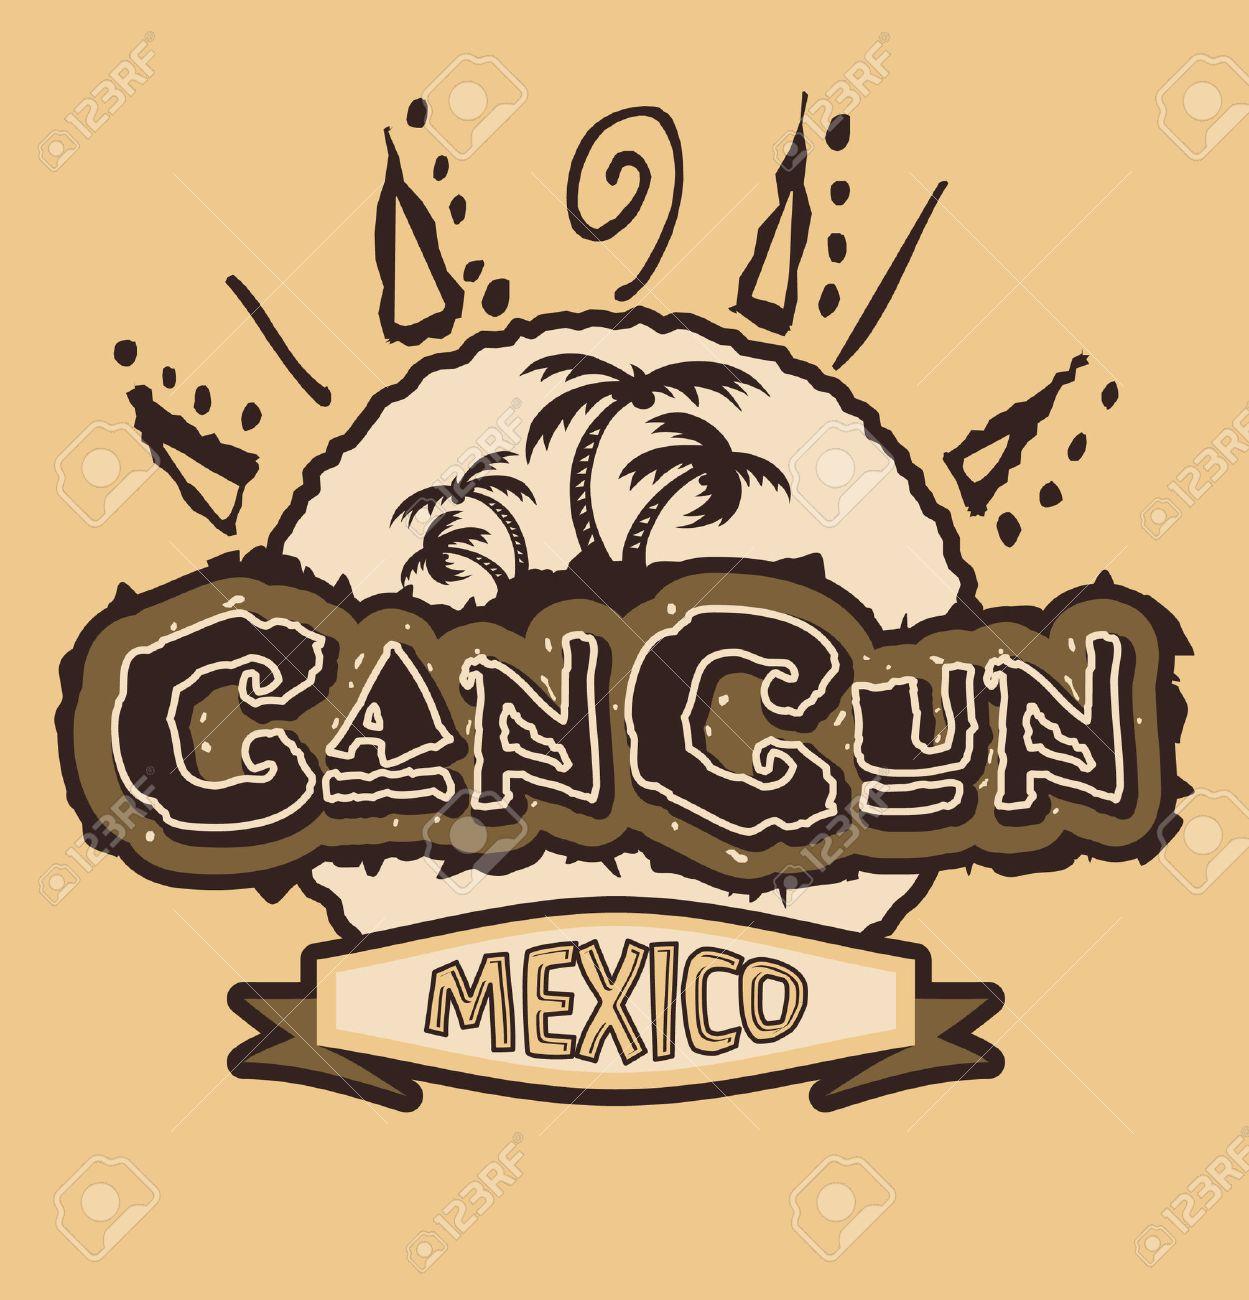 Cancun Mexico Vintage Vector Badge Emblem Shirt Print Royalty